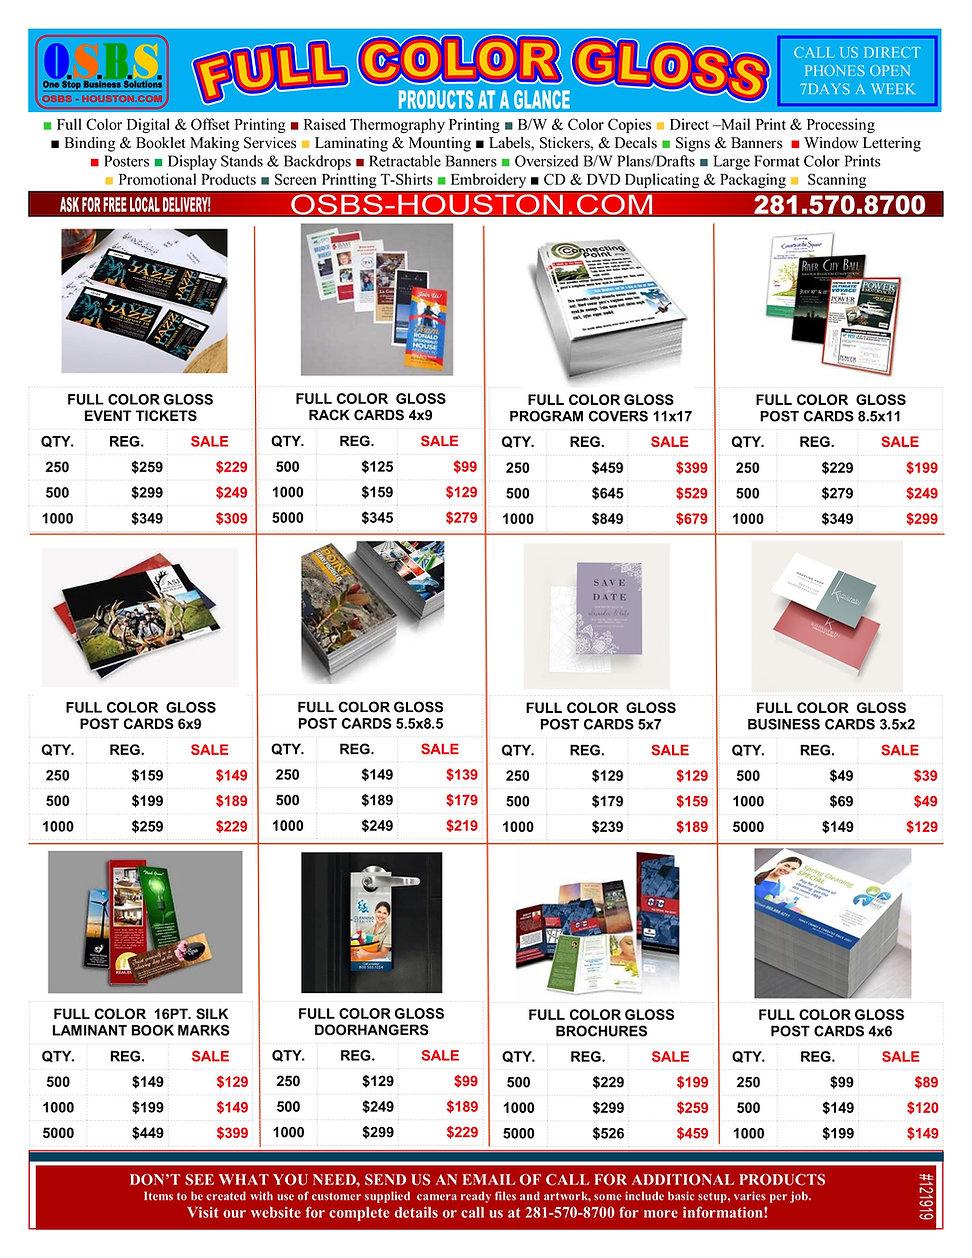 OSBS WEB full color product list.jpg